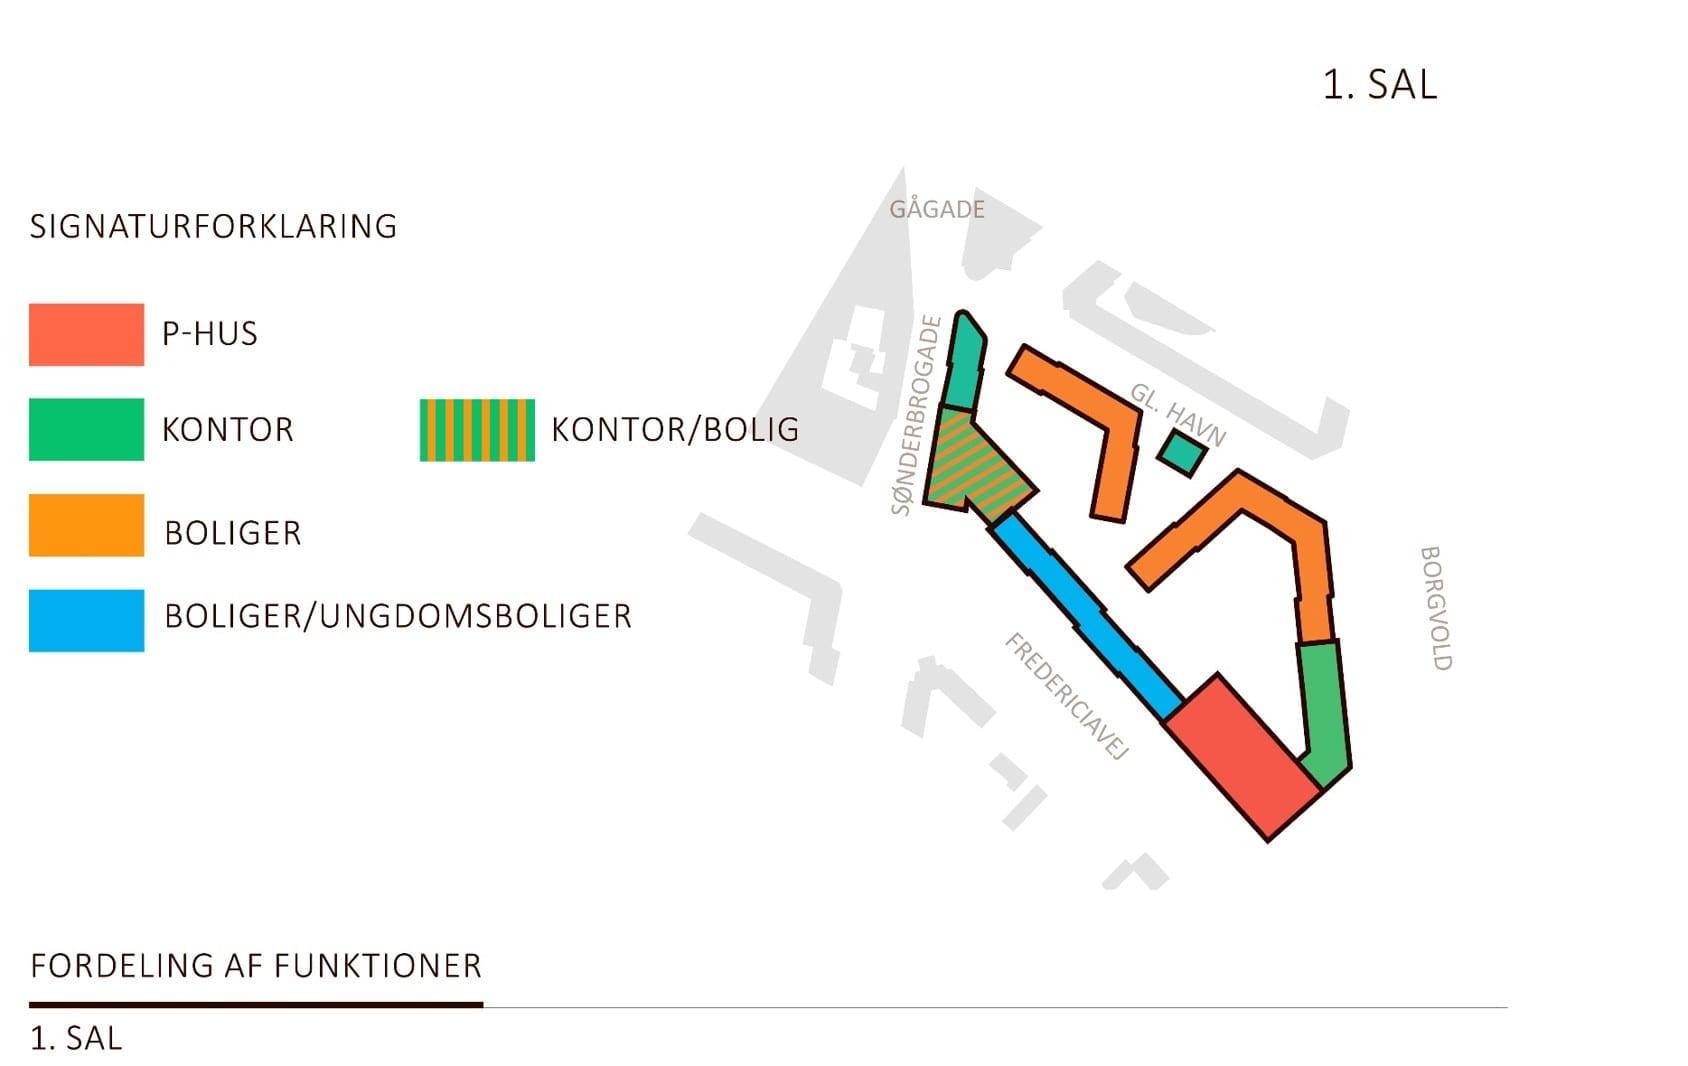 gammelhavn_diagram_1.sal